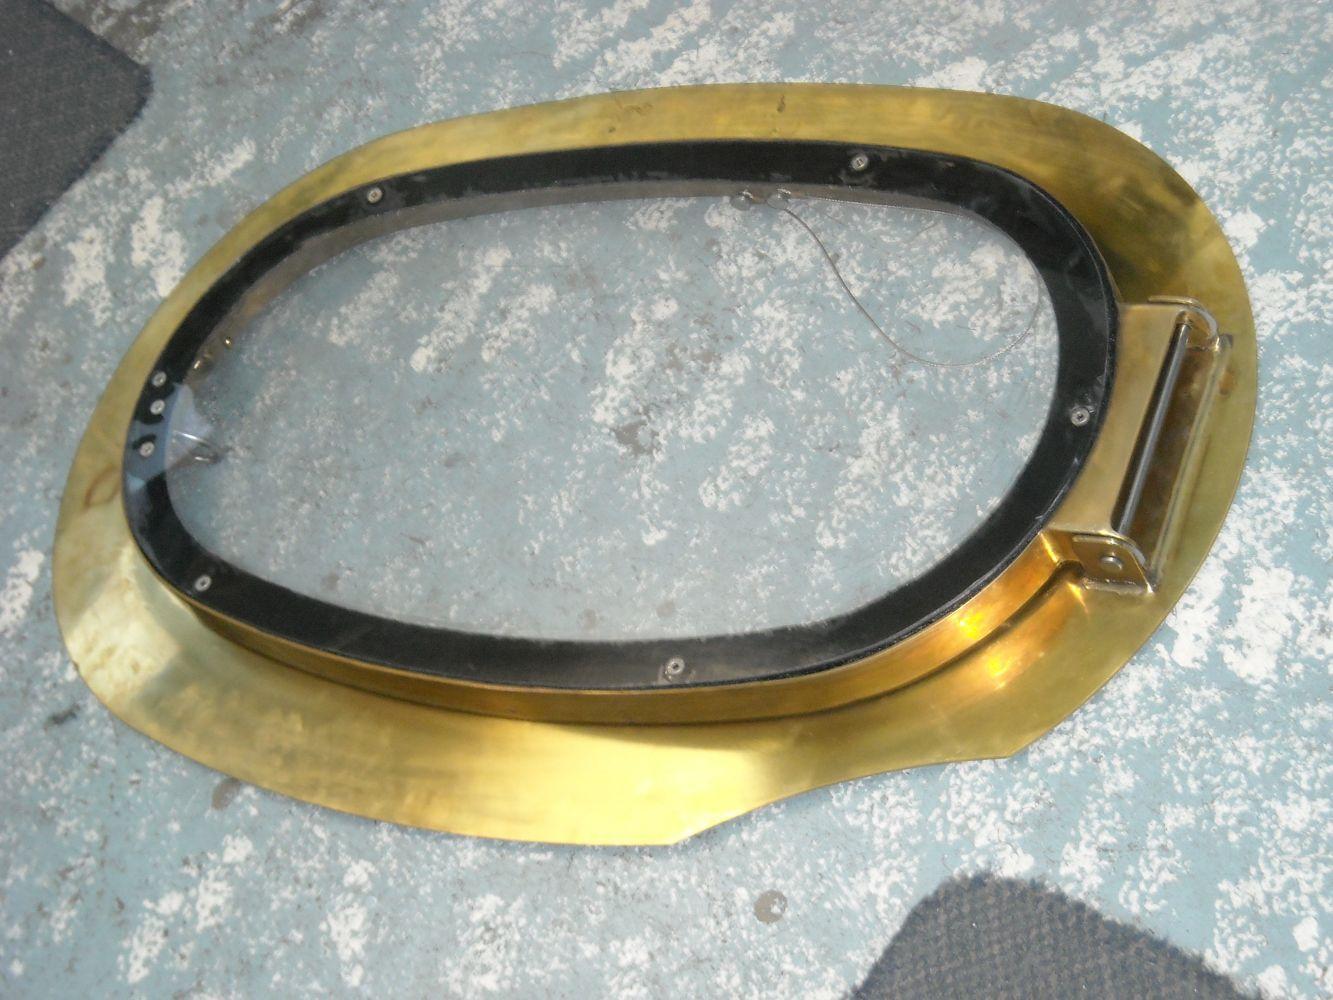 Brass hatch